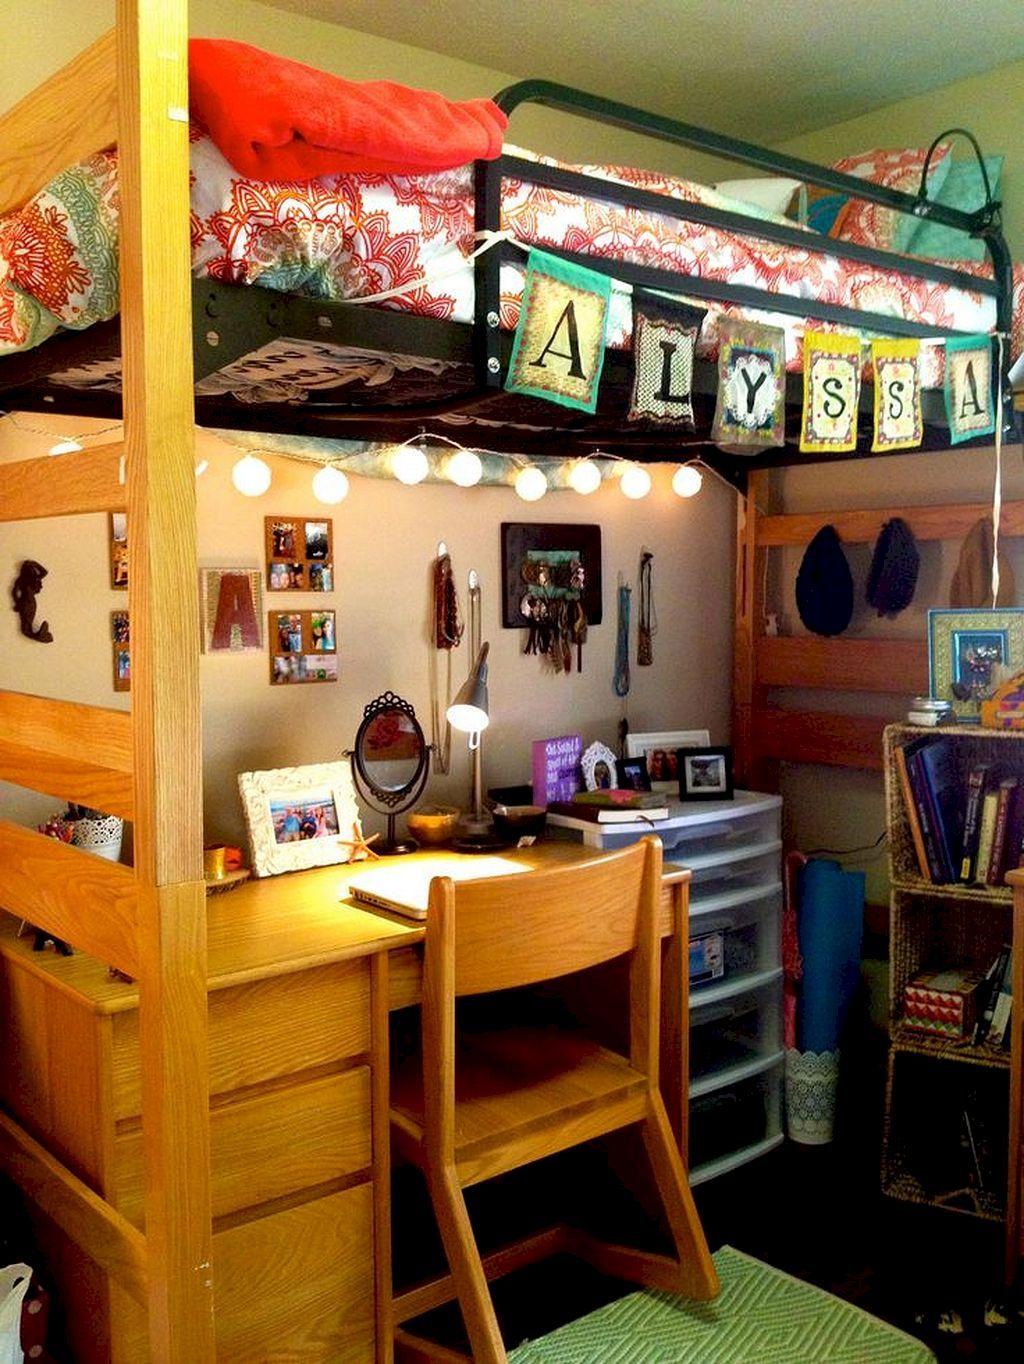 Cute loft bed ideas   Cute Loft Beds College Dorm Room Design Ideas For Girl